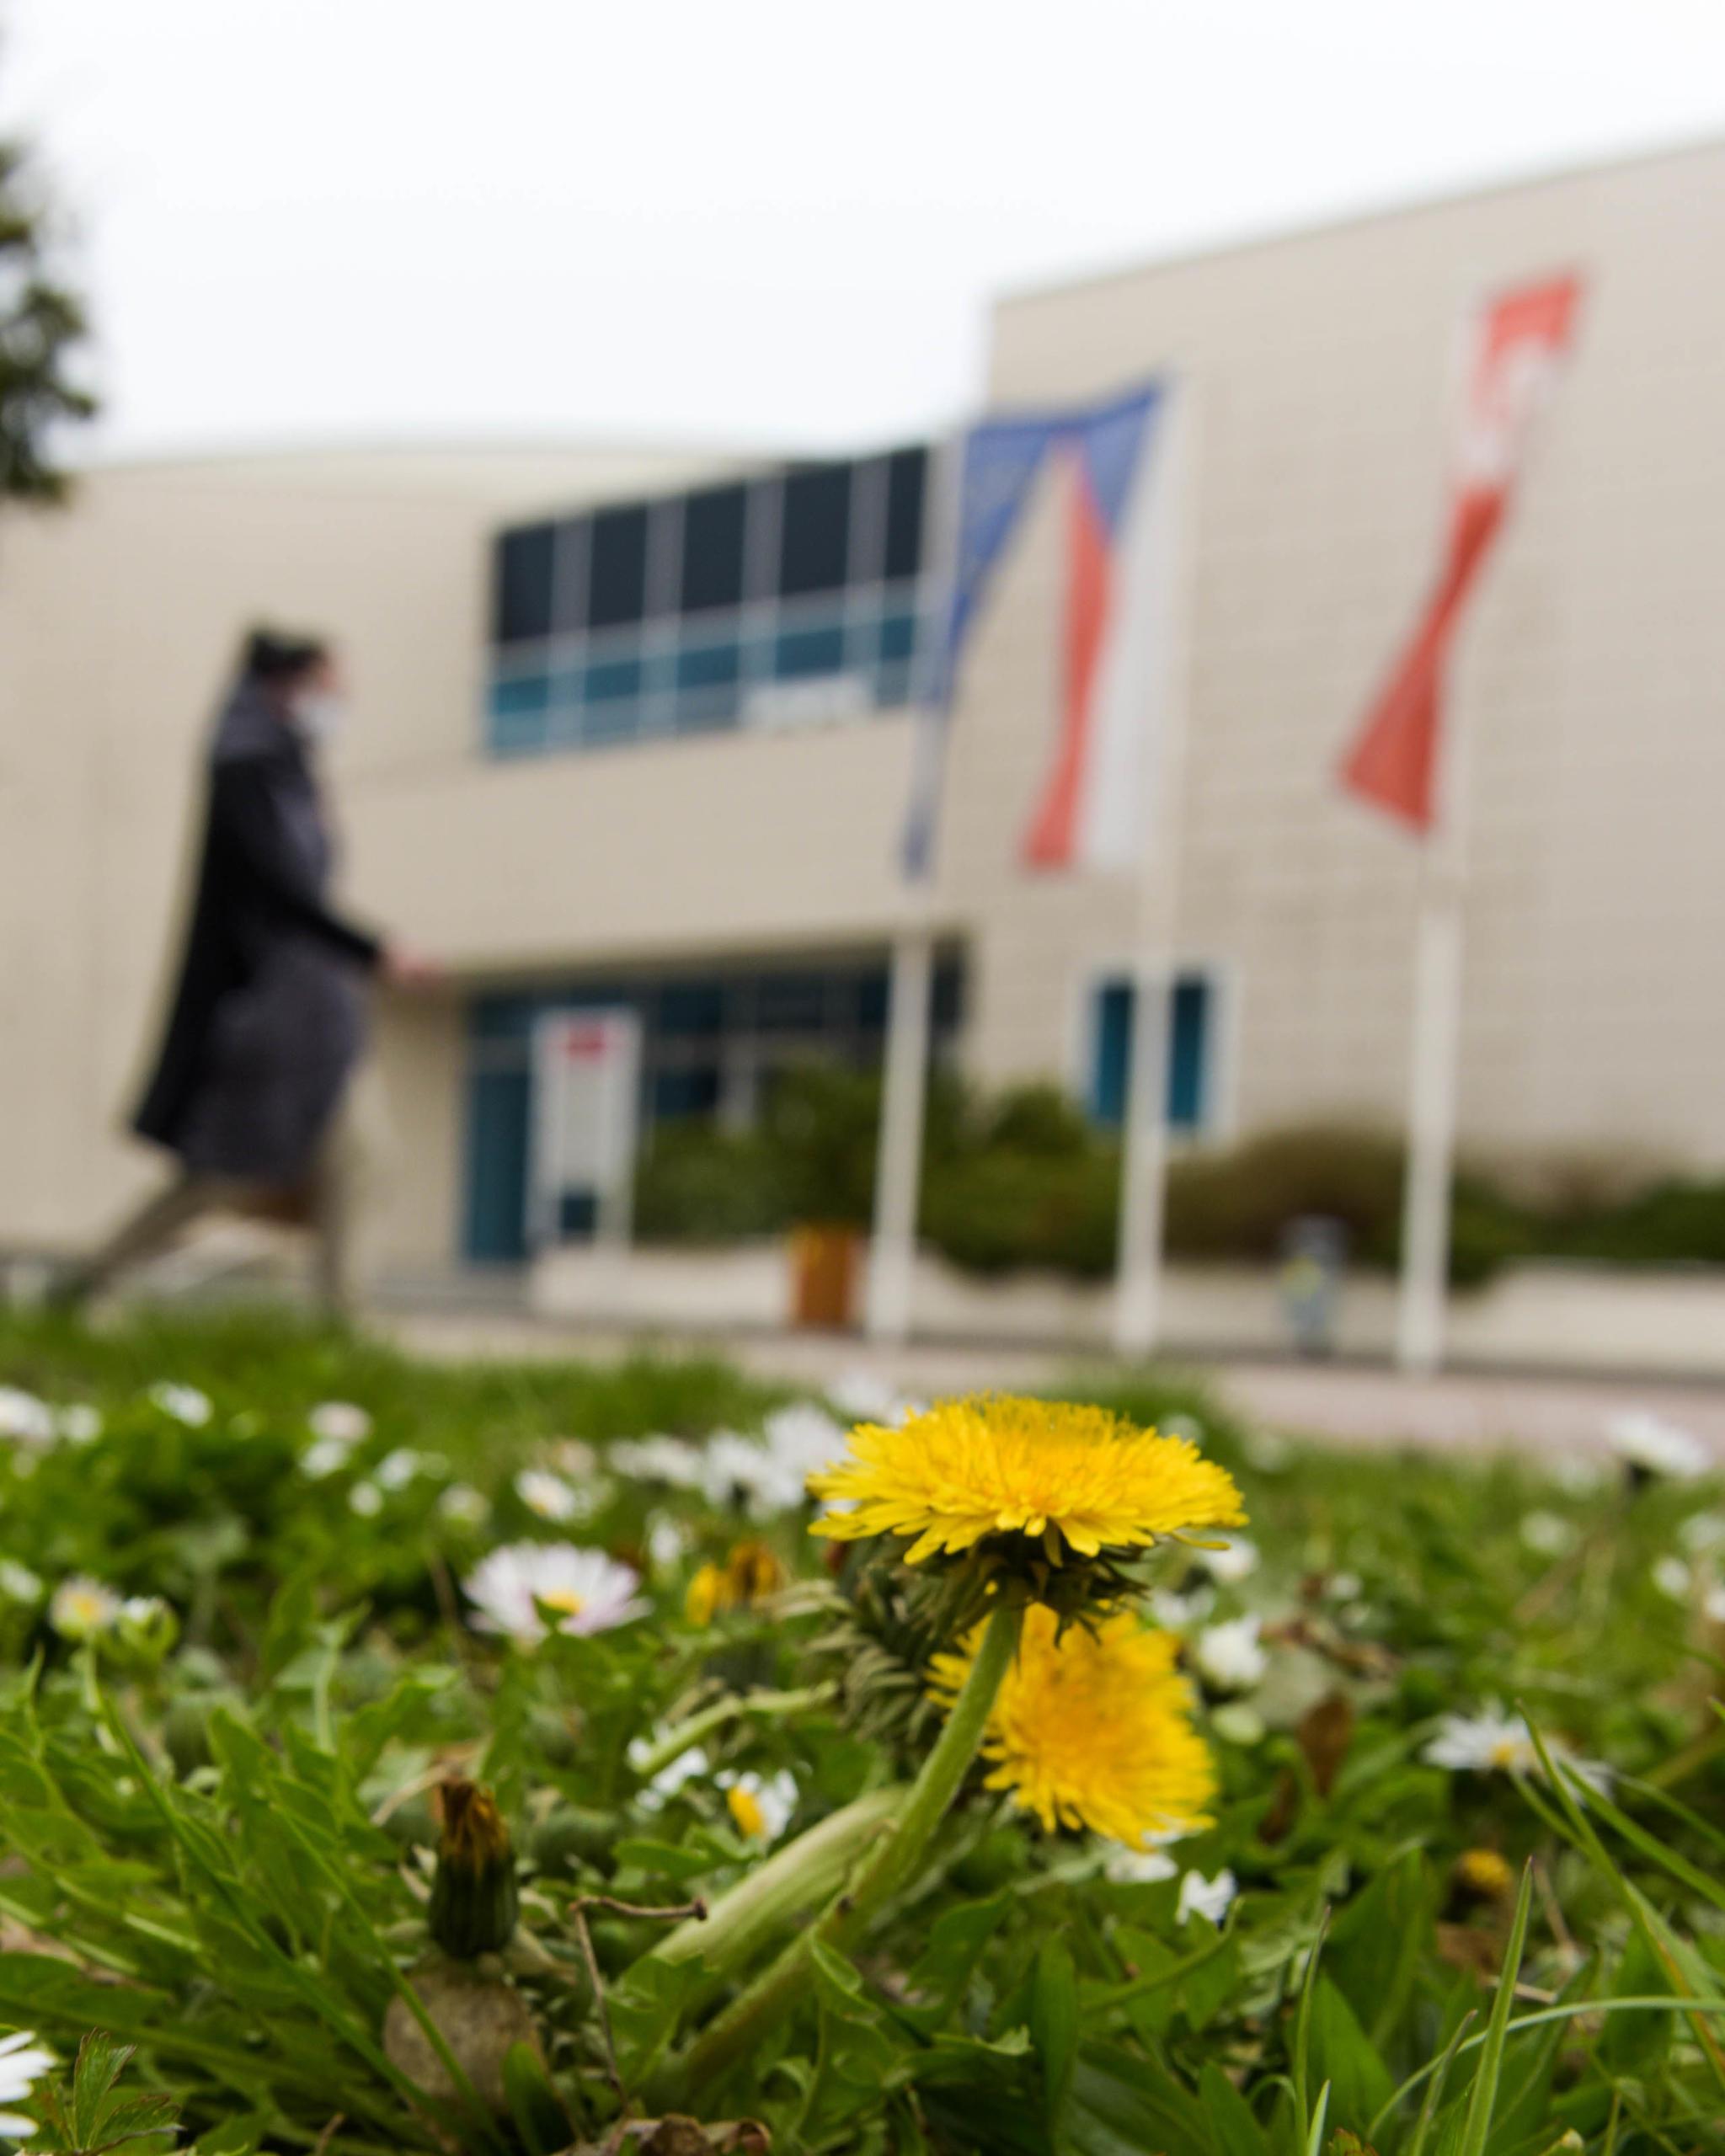 Fotogalerie: Univerzita v čase koronaviru